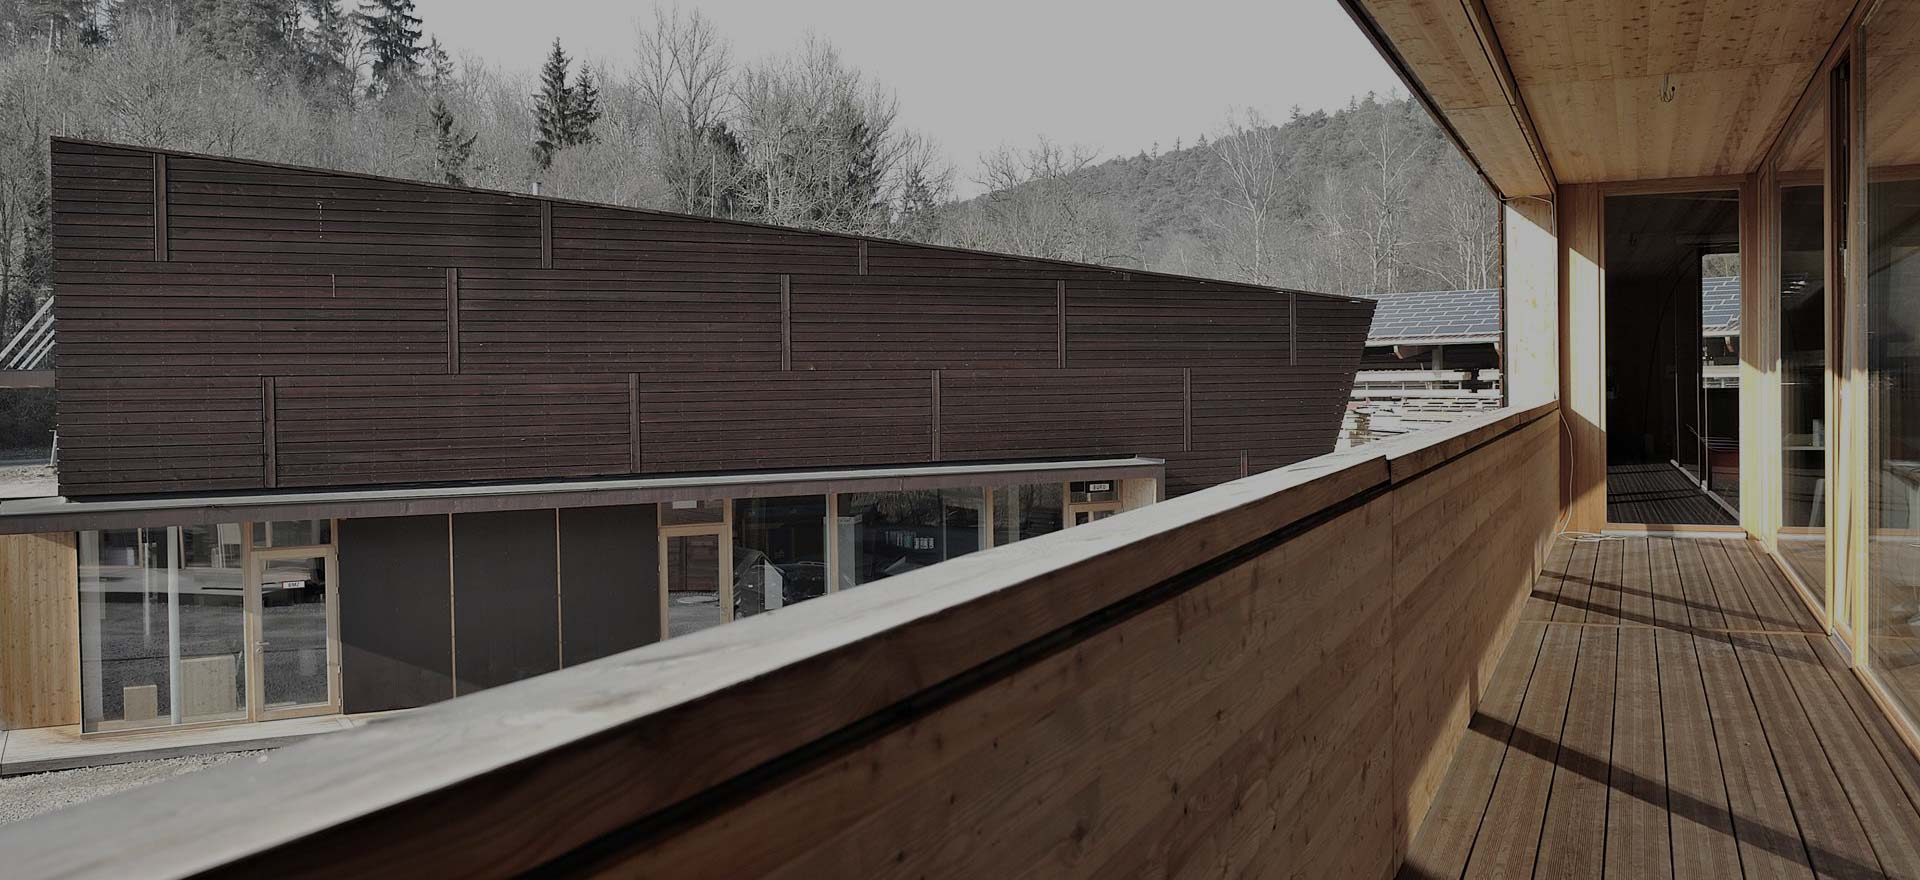 Holz Waidelich Waldenbuch premium holzhandel altholz wandgestaltung holz waidelich